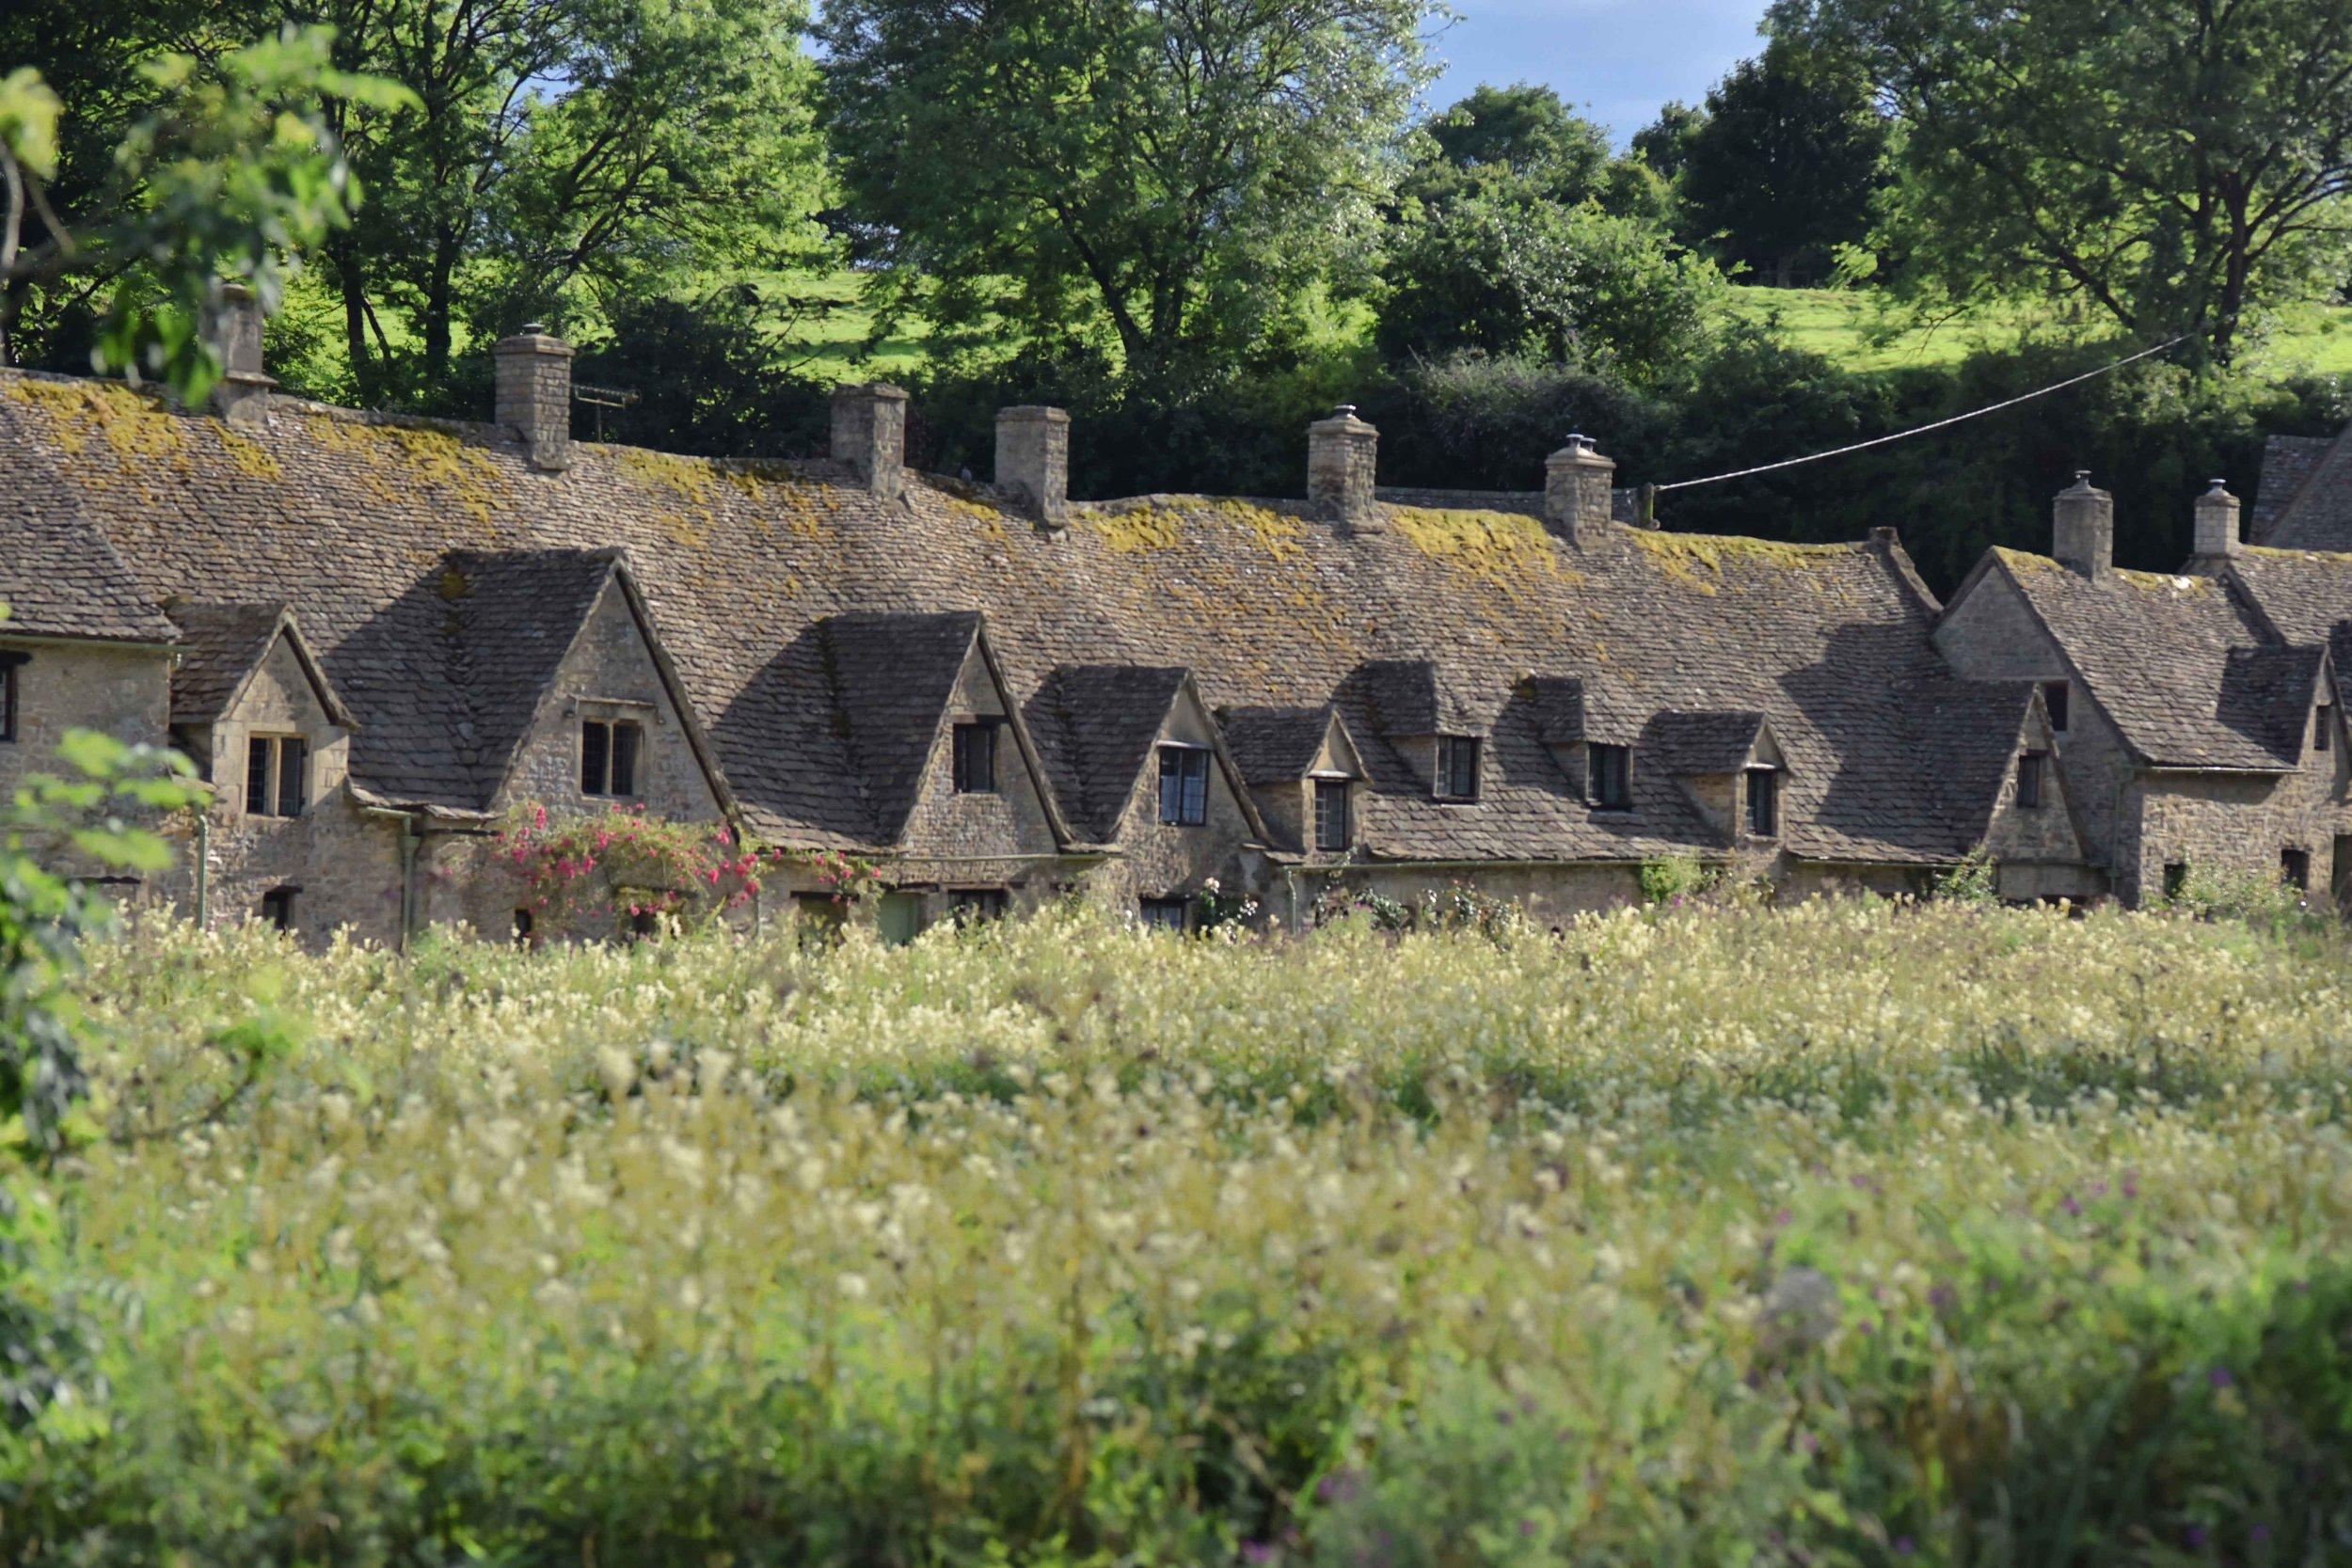 Cotswold stone cottages, Arlington Row, Bibury, Cotswold, England. Image©sourcingstyle.com